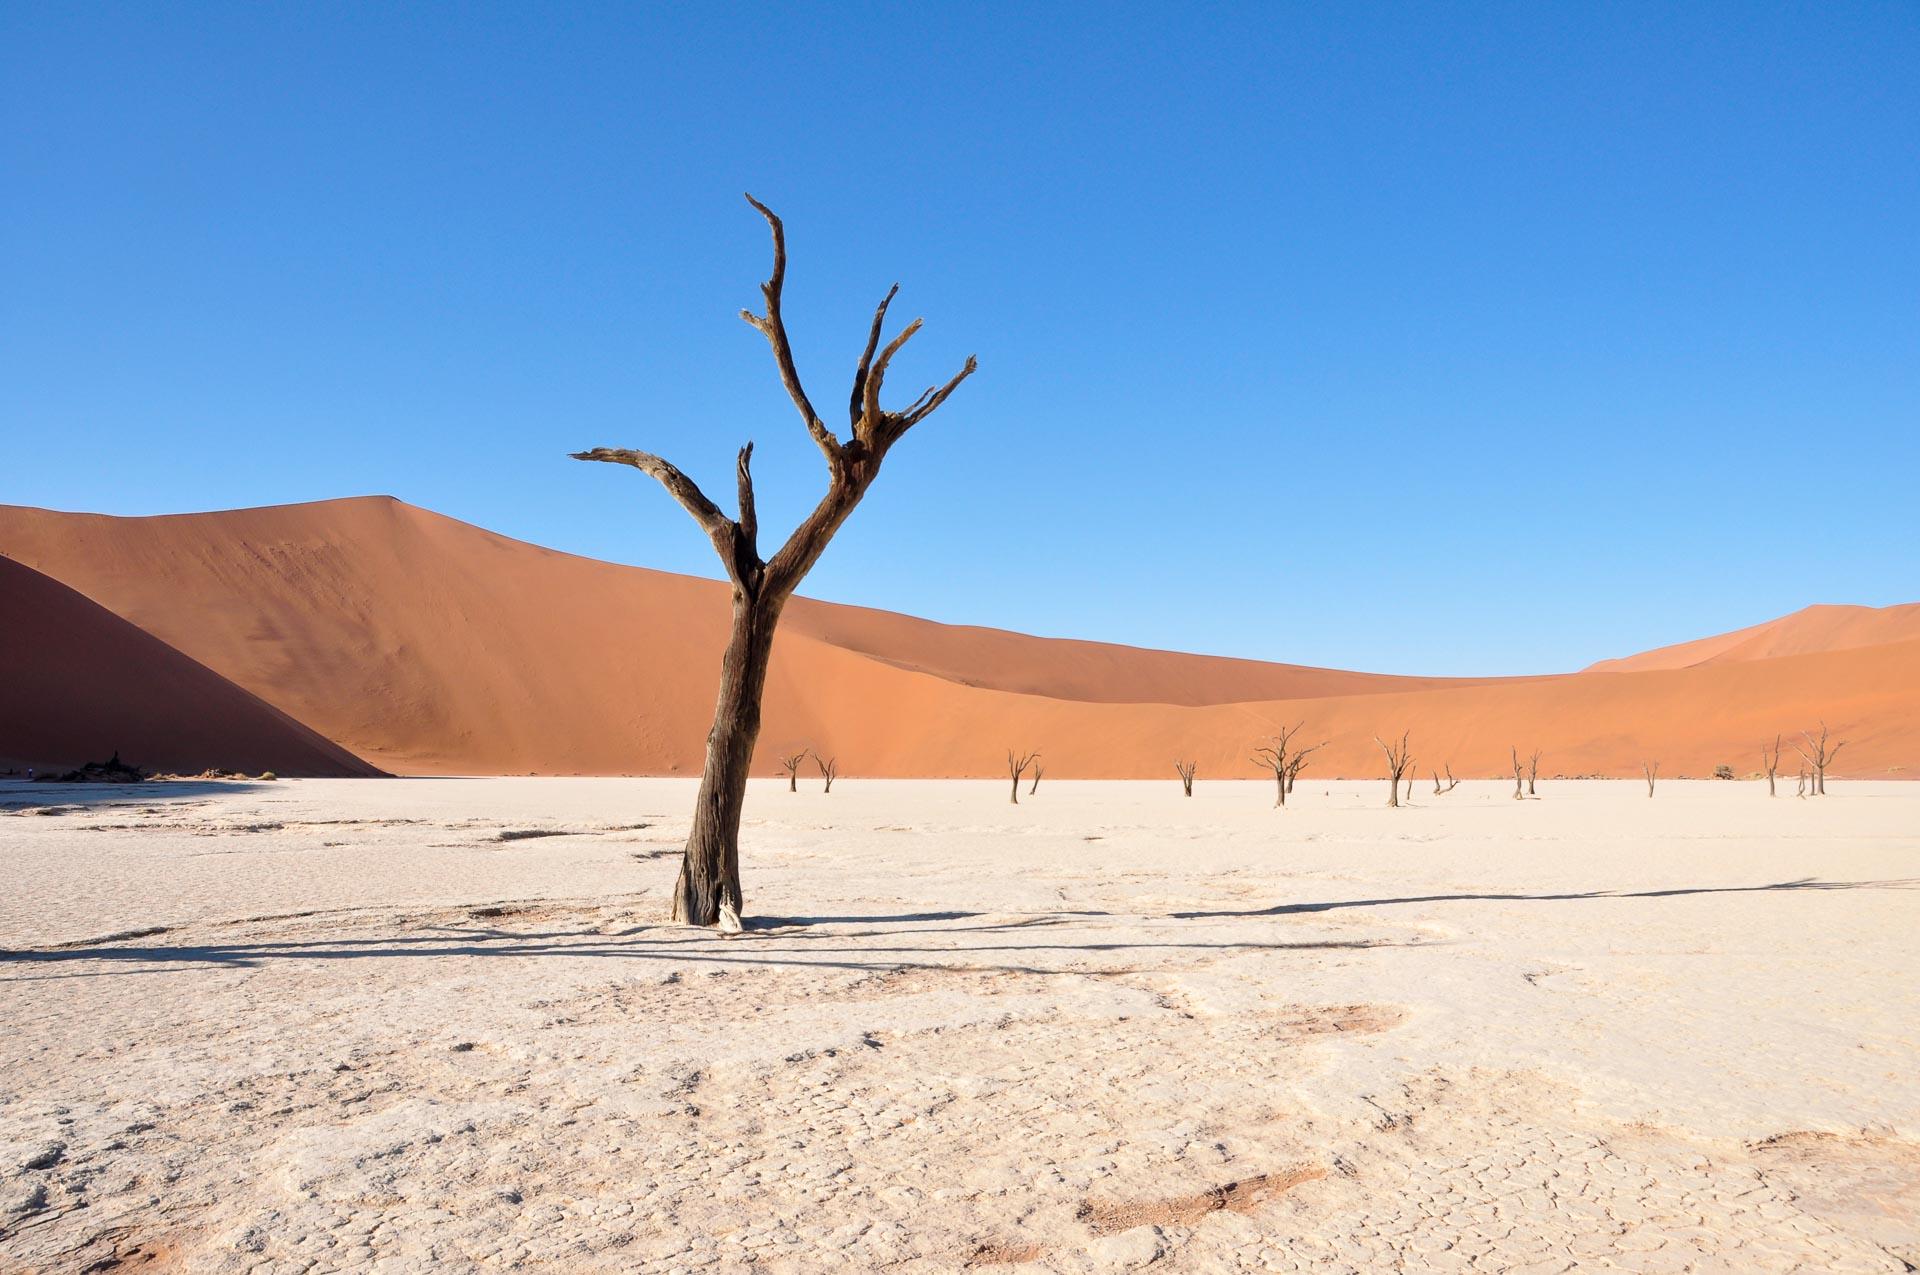 Sossuvlei-Wueste-Namib-Namibia-Globetrotter-Select-22